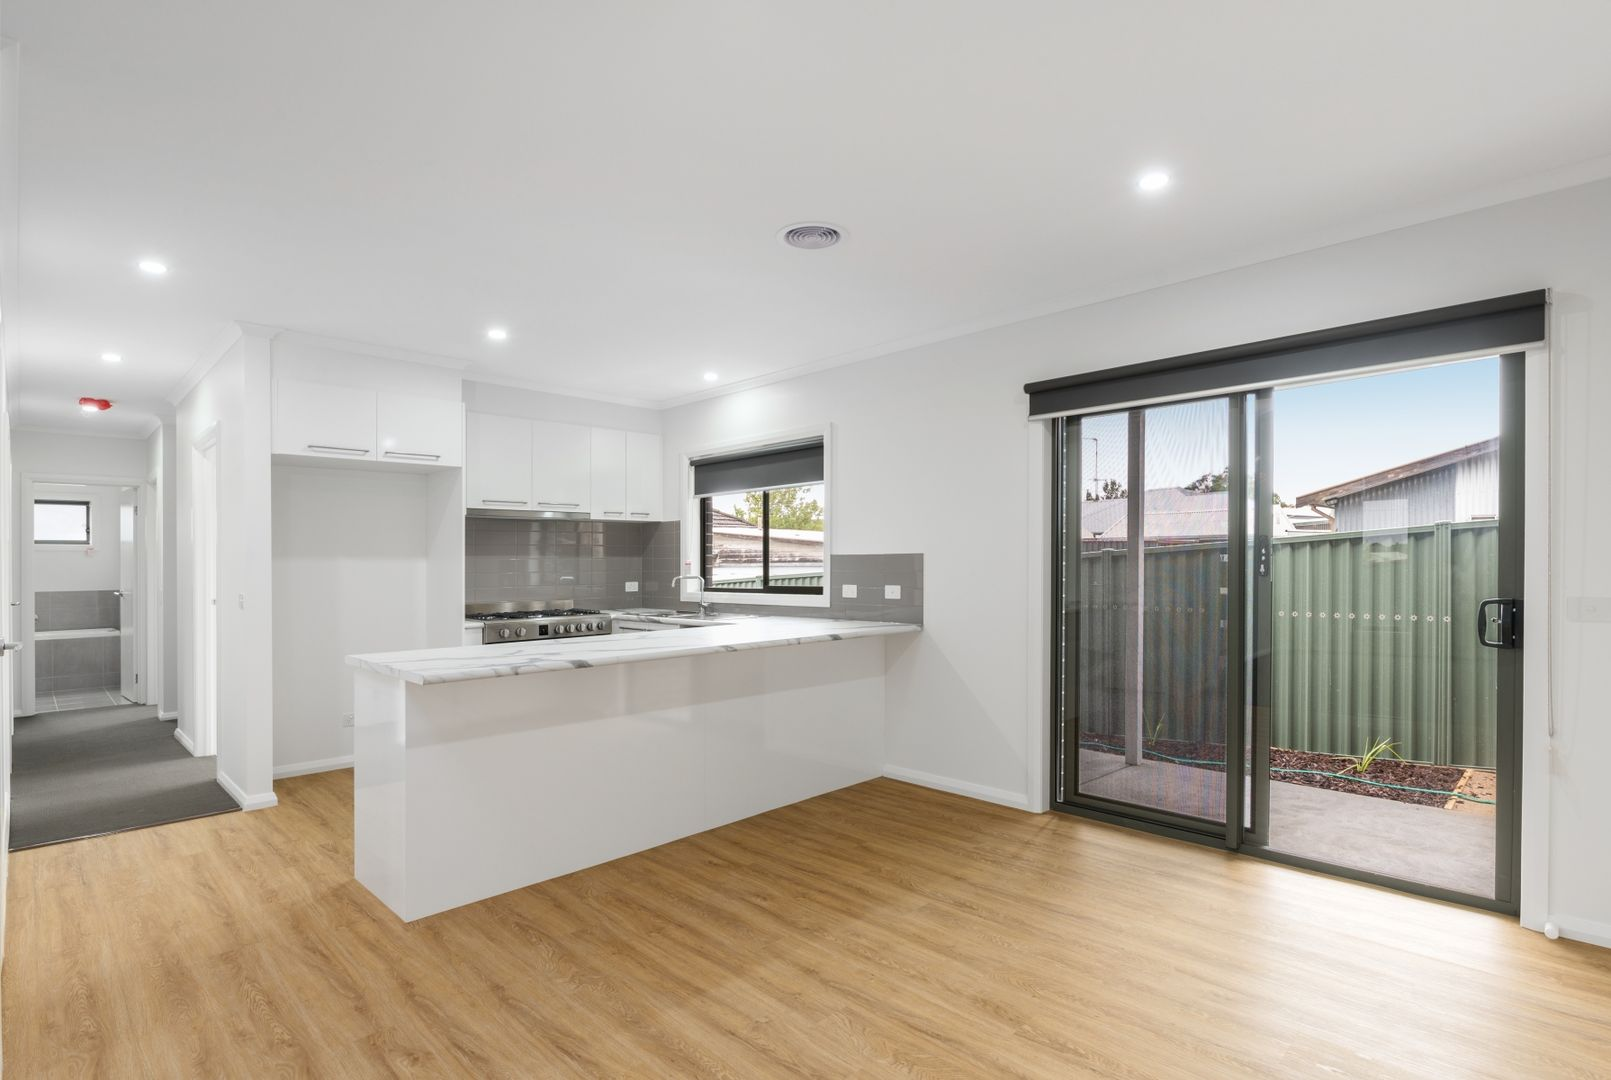 2/304 York Street, Ballarat East VIC 3350, Image 1